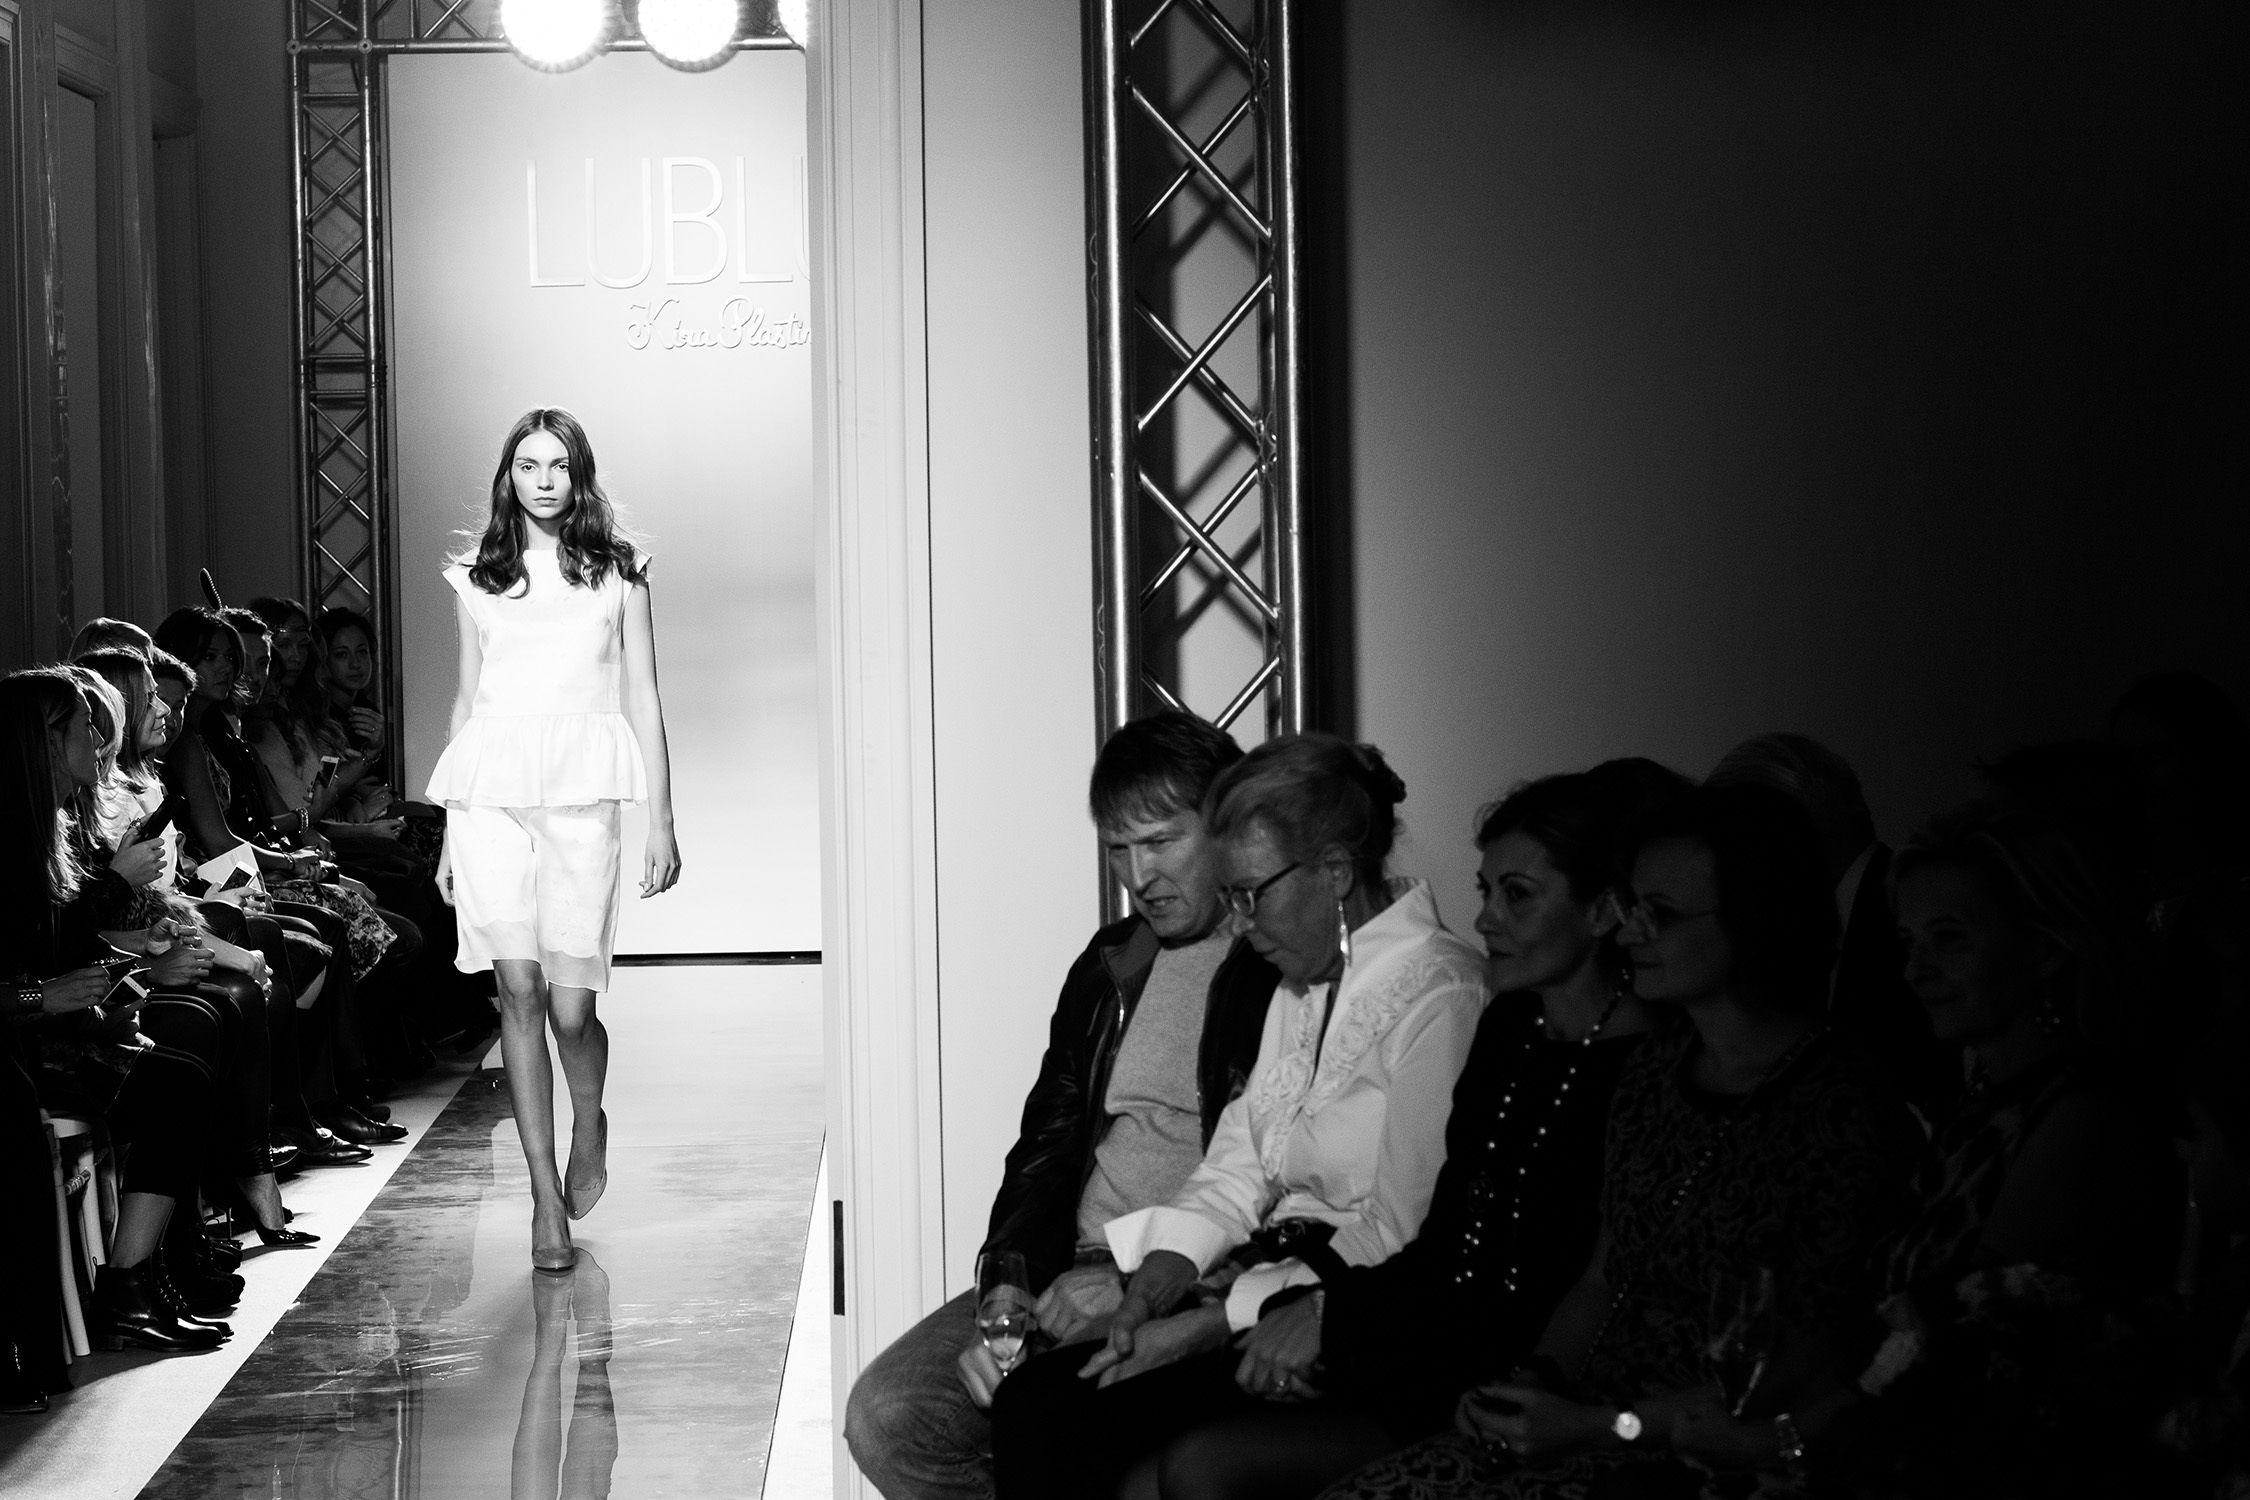 LUBLU Kira Plastinina runway. SS14 fashion show.